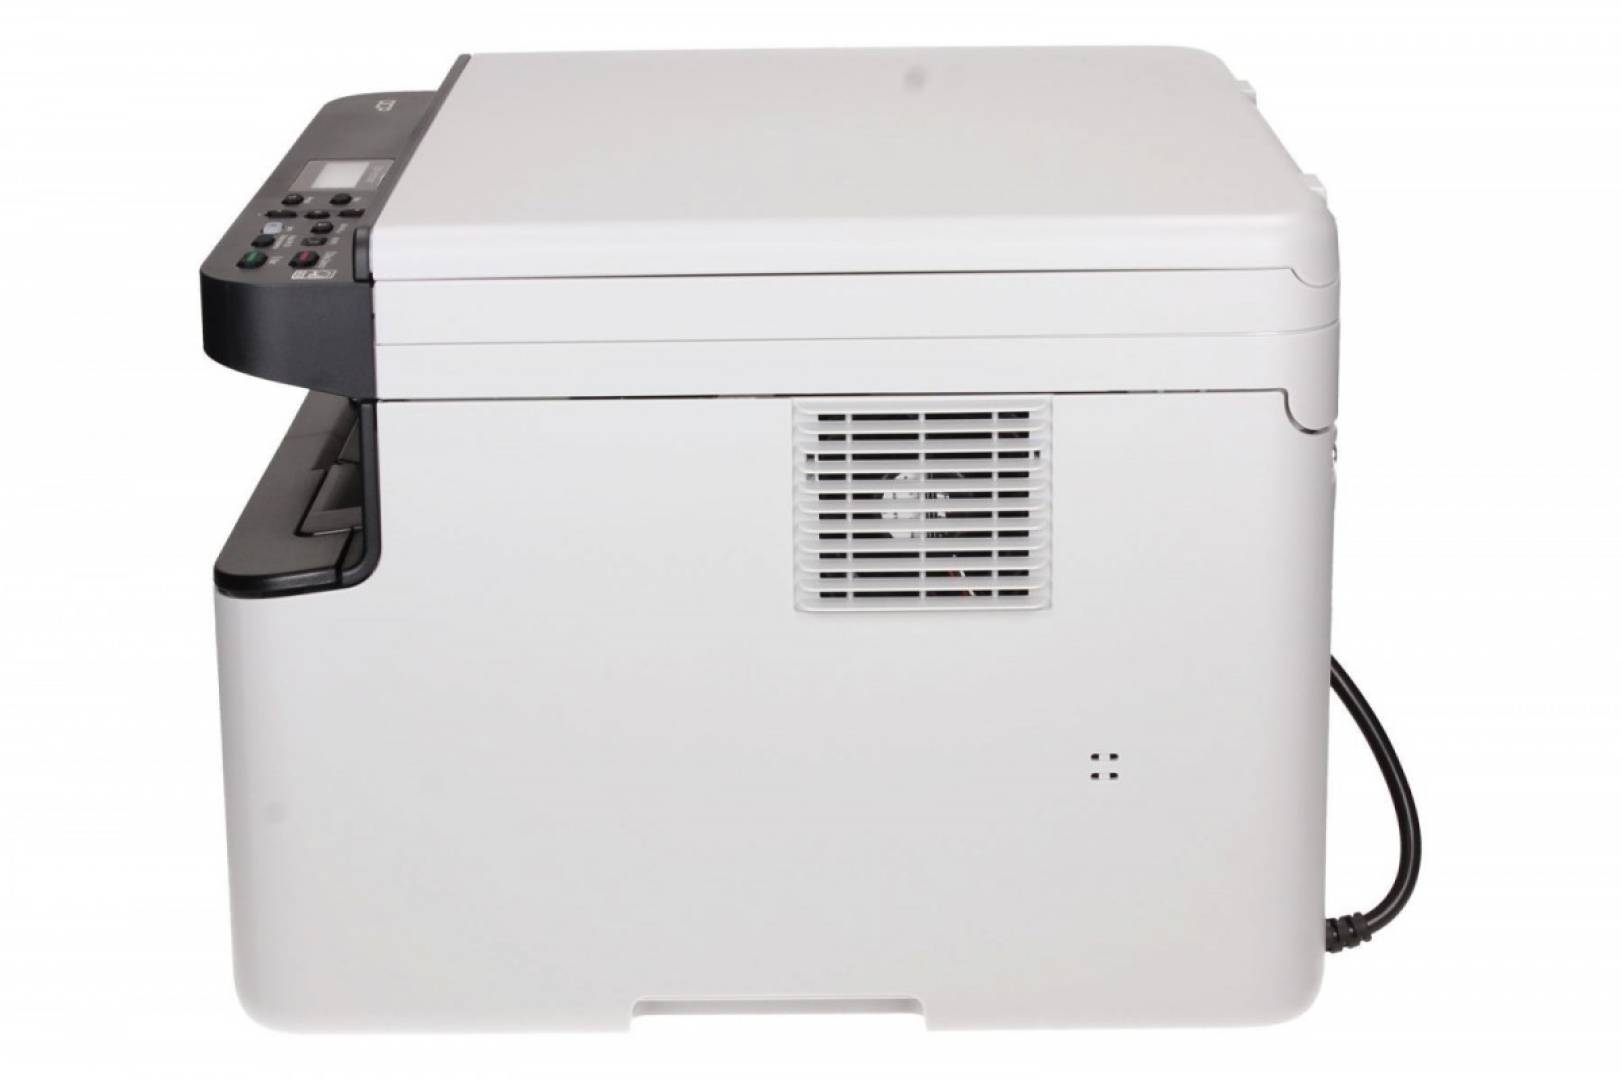 DCP-1610WE A4, 20ppm, USB, WiFi